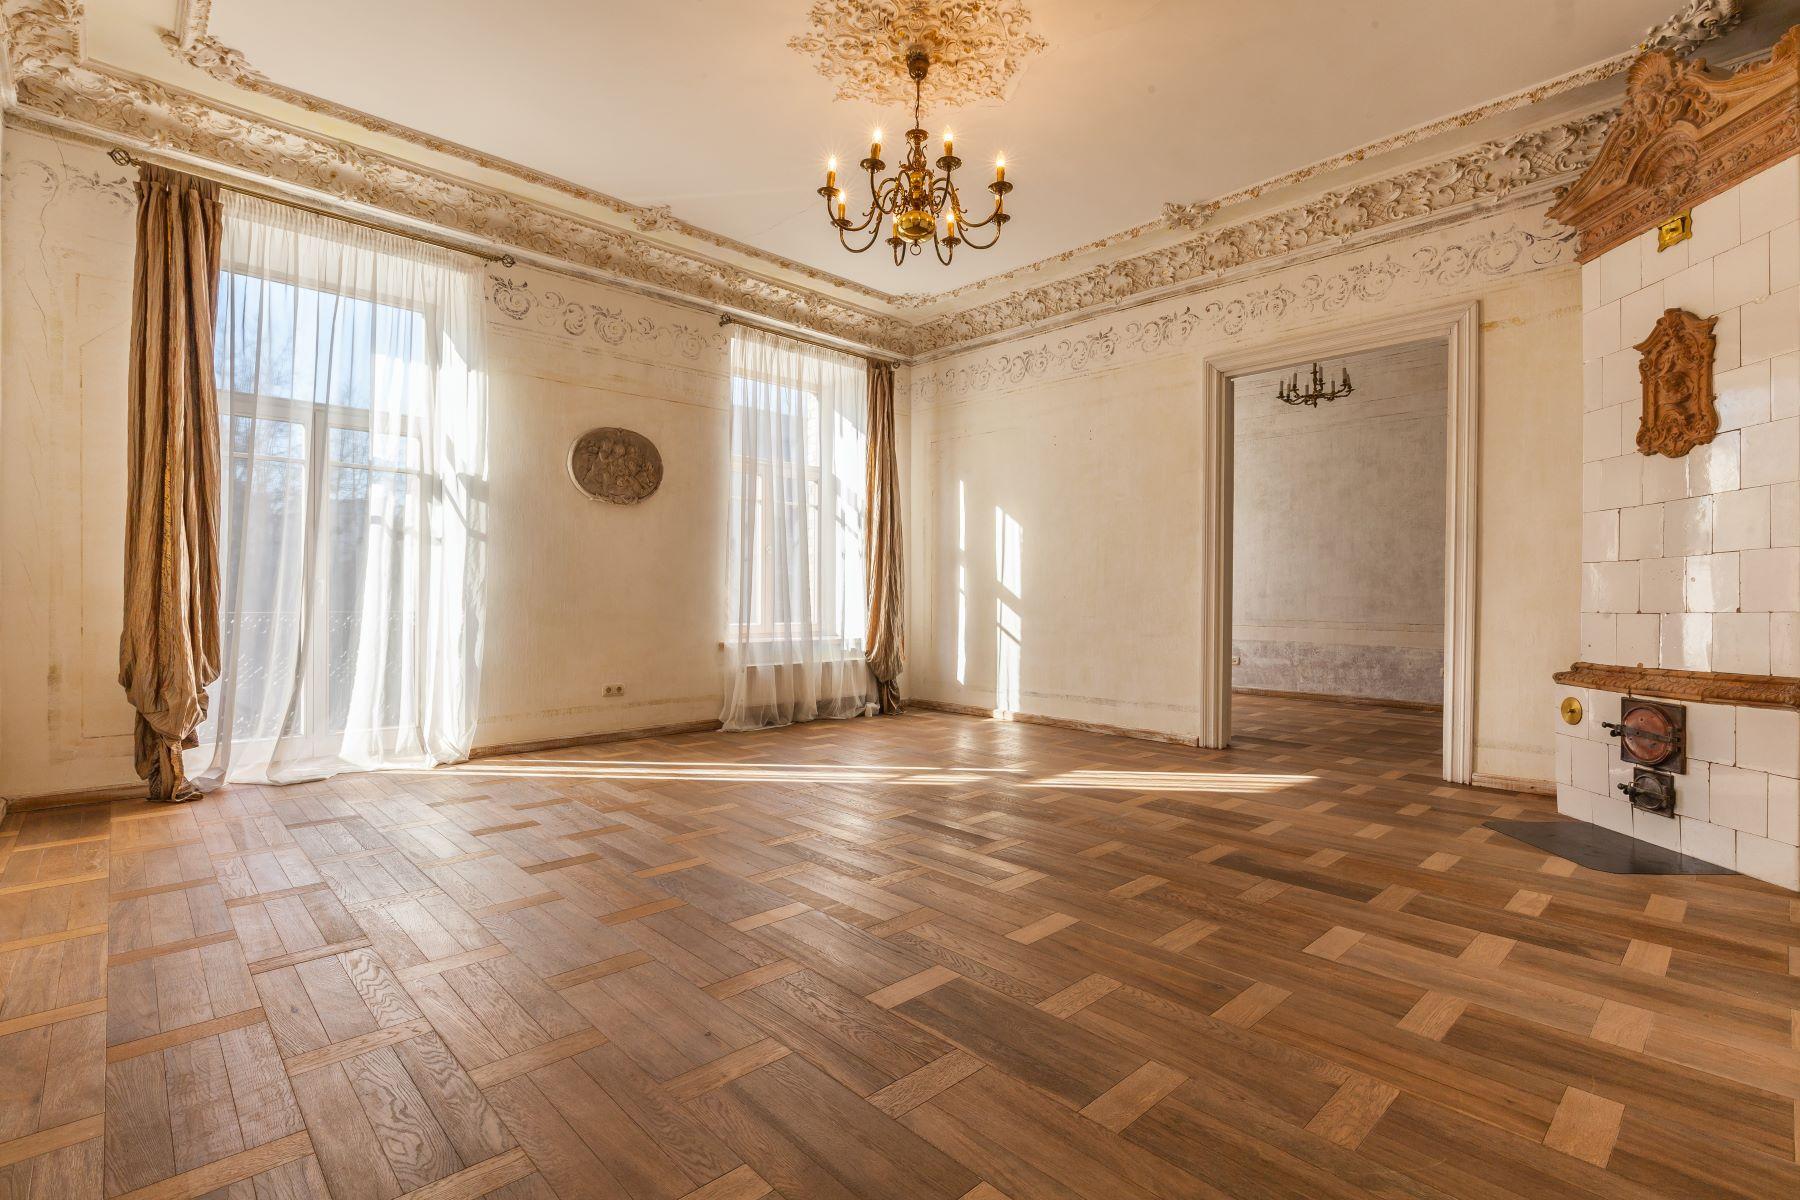 Apartment for Rent at Modern Luxury Apartments Vilnius, Vilnius County, Lithuania